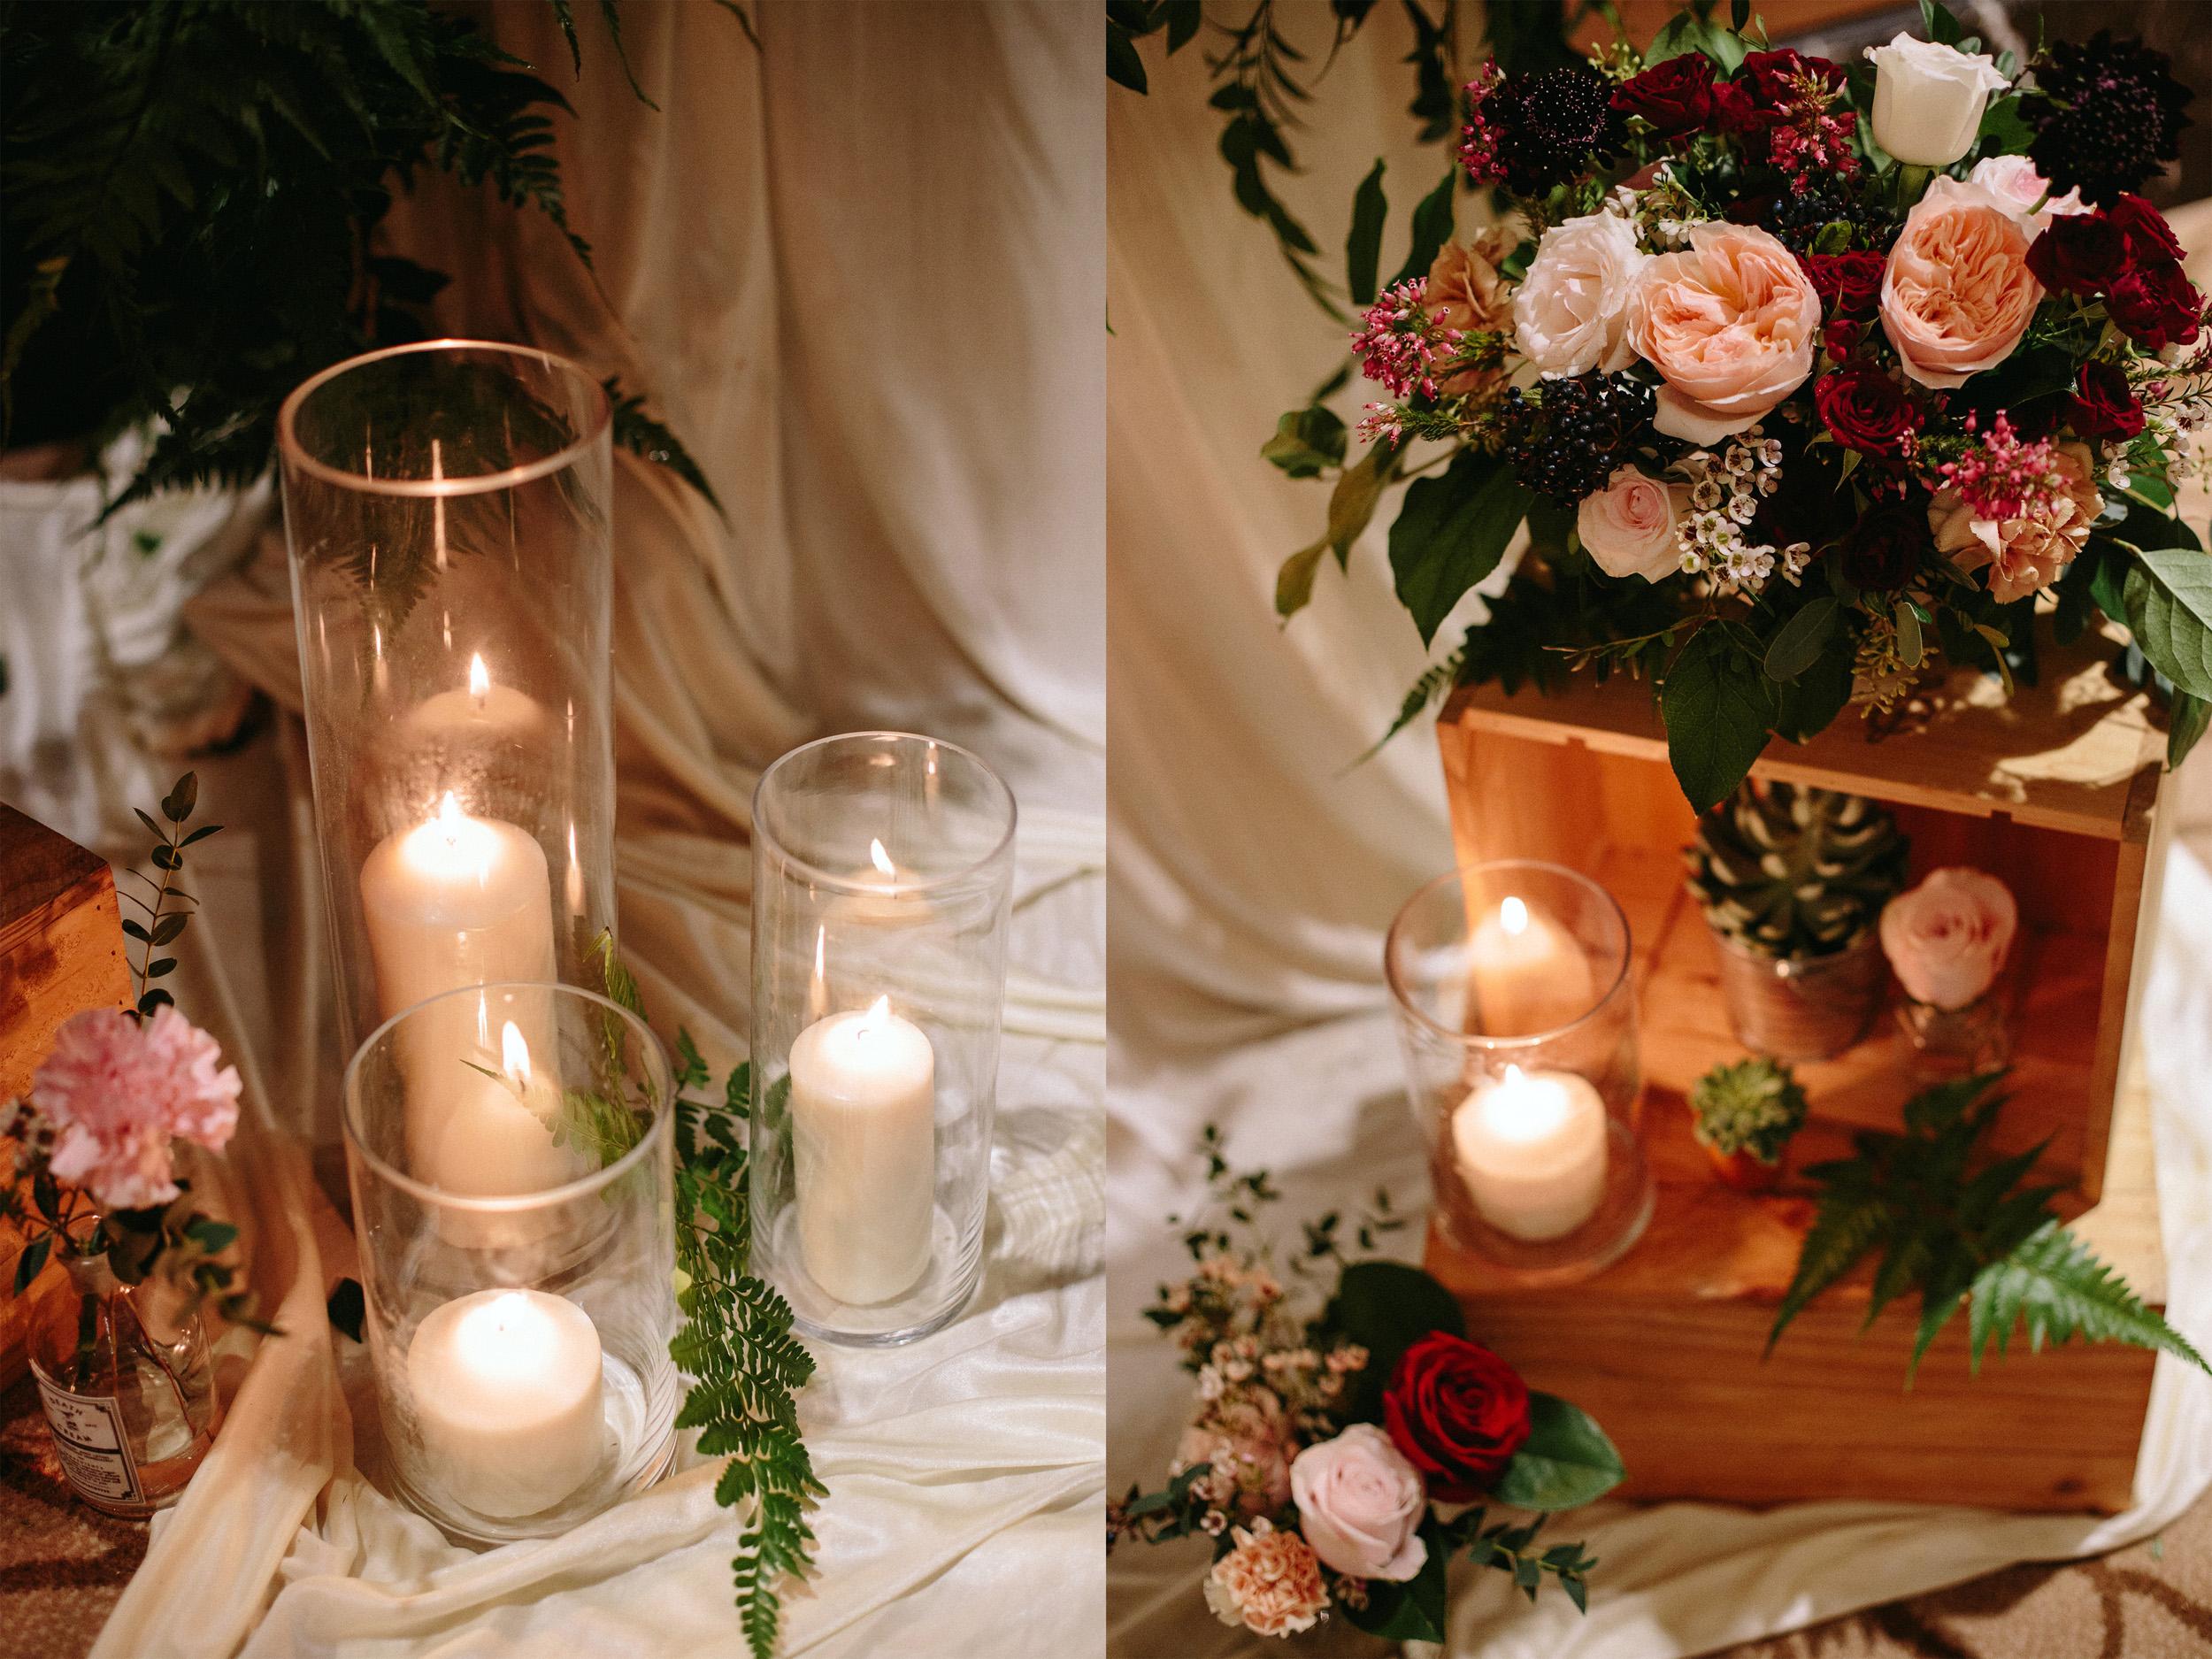 singapore-wedding-photographer-photography-wmt2017-043.jpg